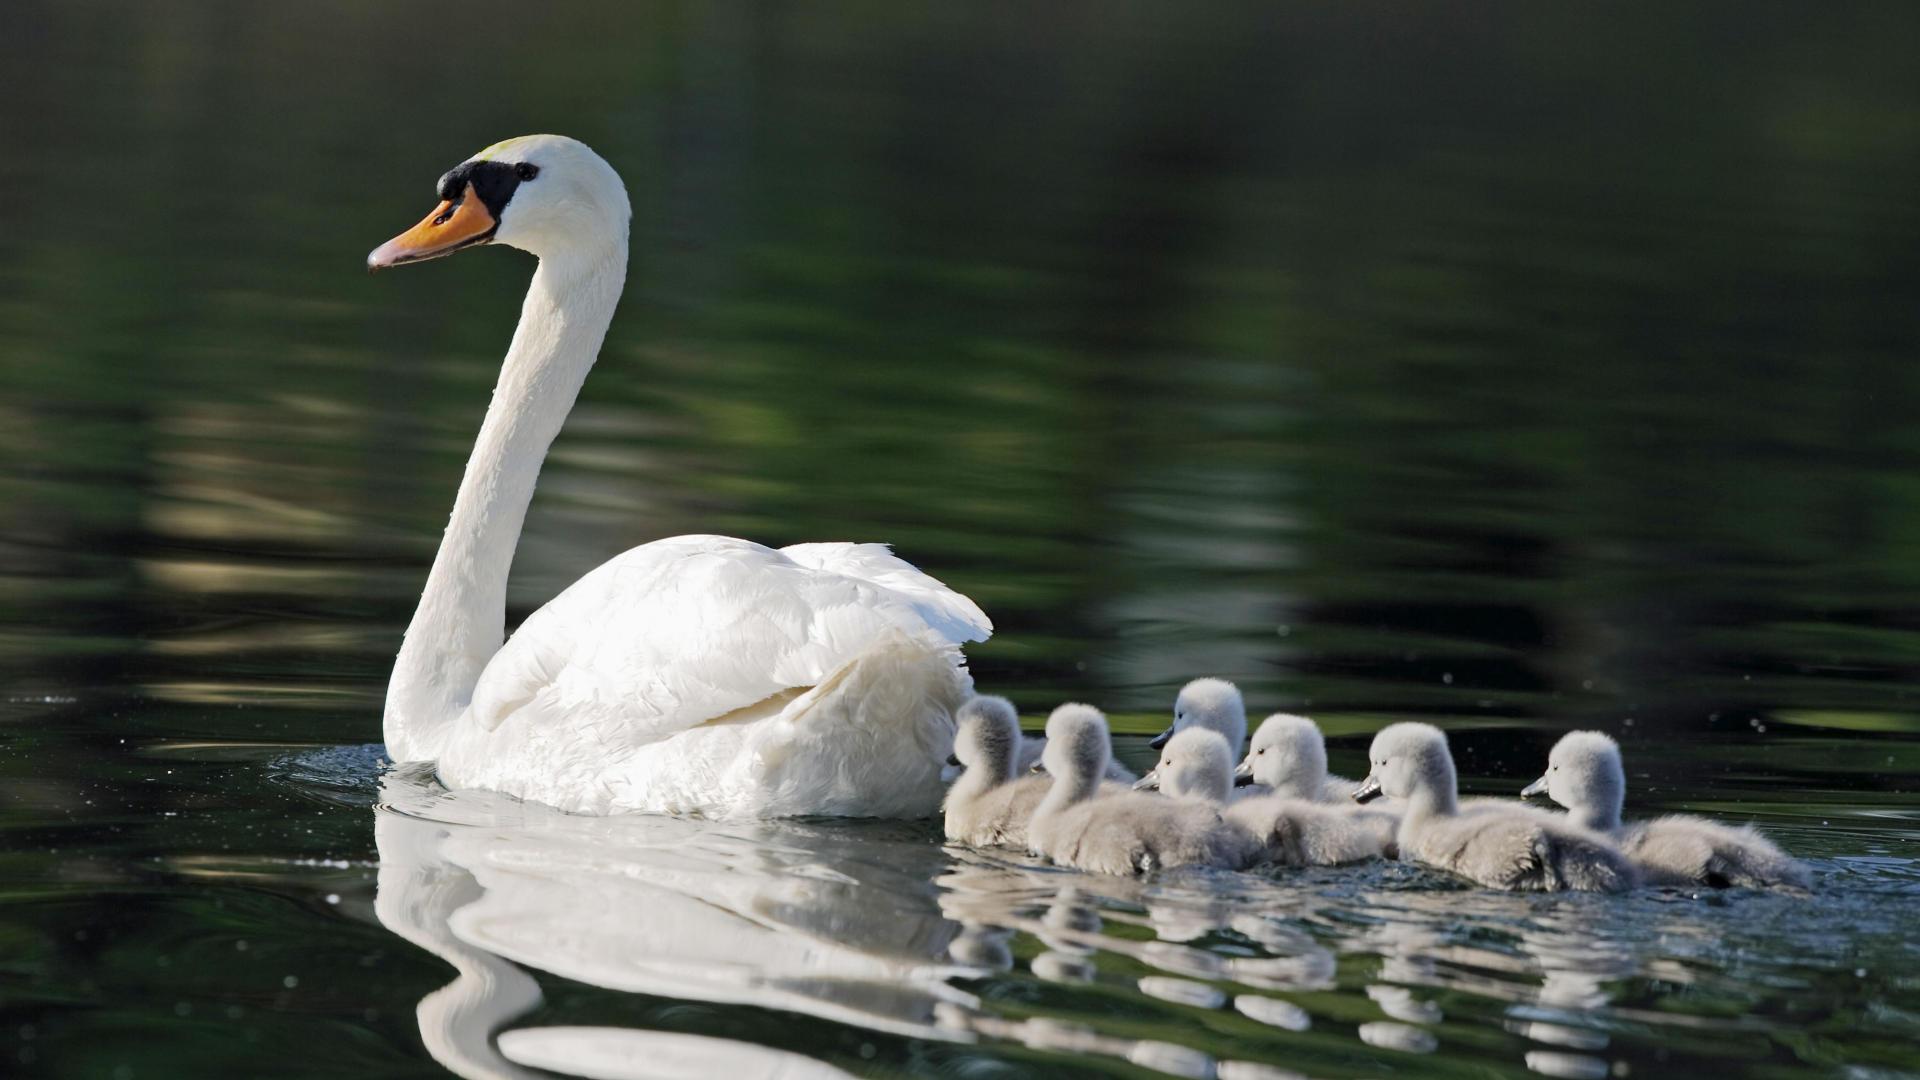 image-computer-background-baby-goose-bird-mother-animals-160354